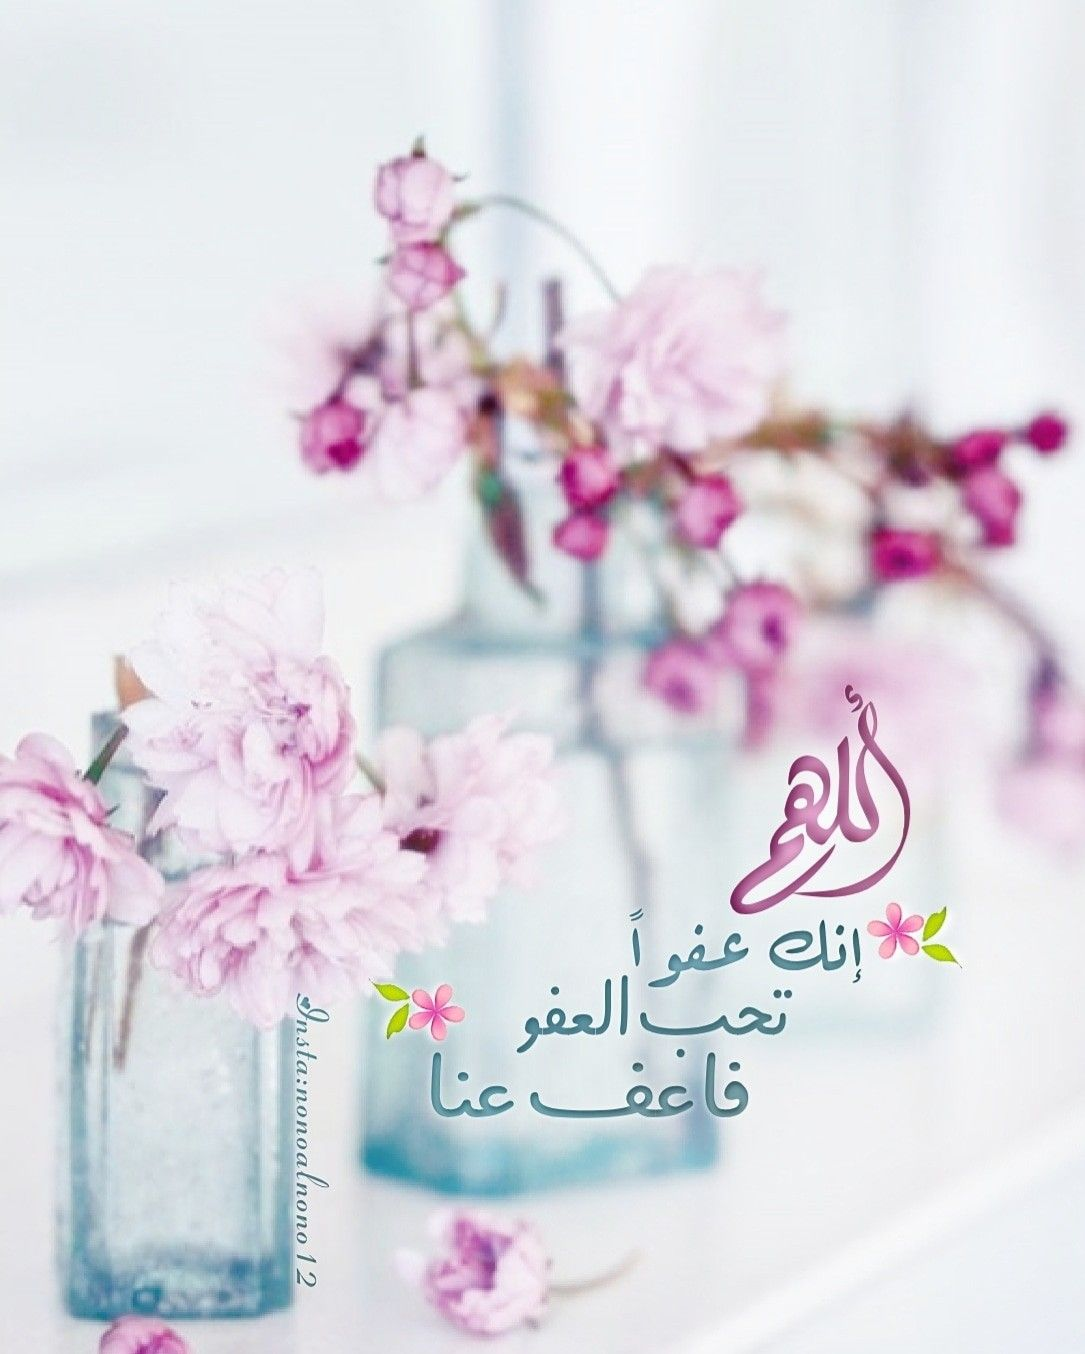 Pin By Hafsa On رمزيات اسلامية Islamic Pictures Friday Messages Ramadan